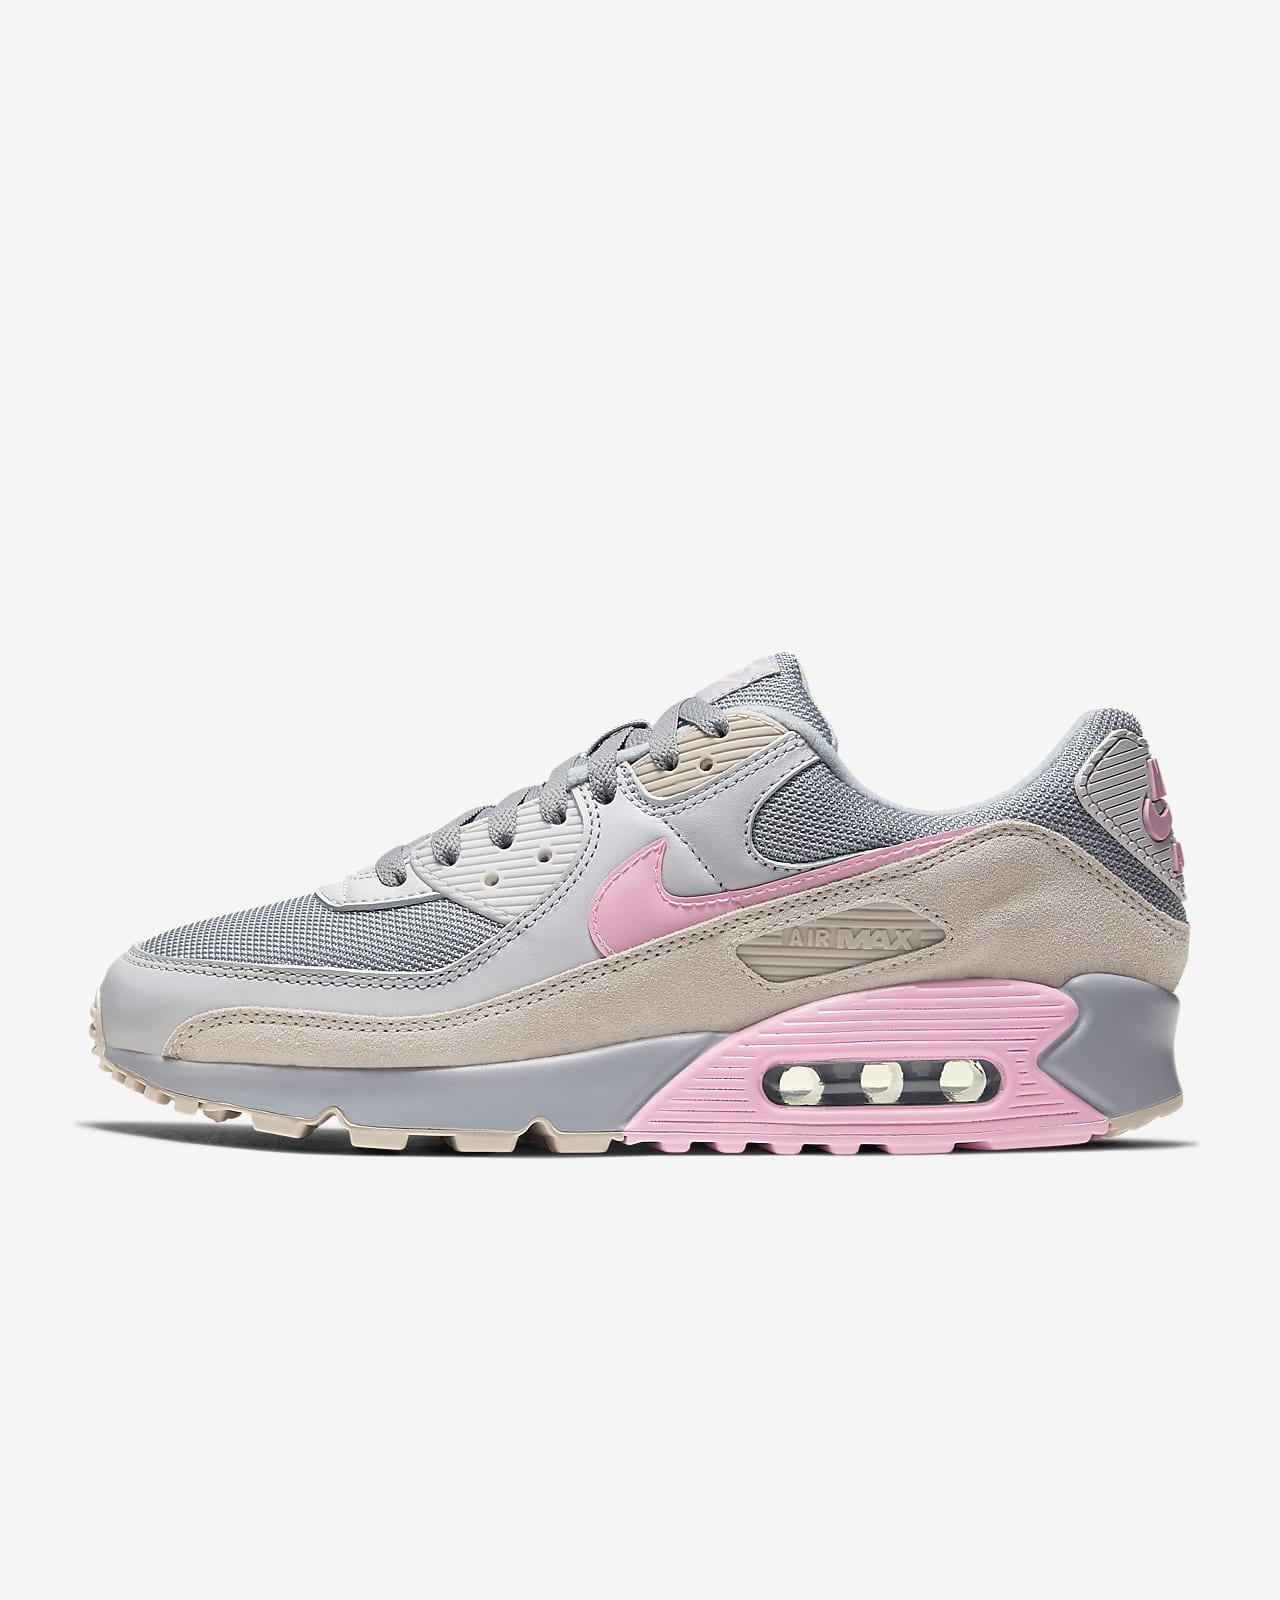 air max 90 rosa uomo